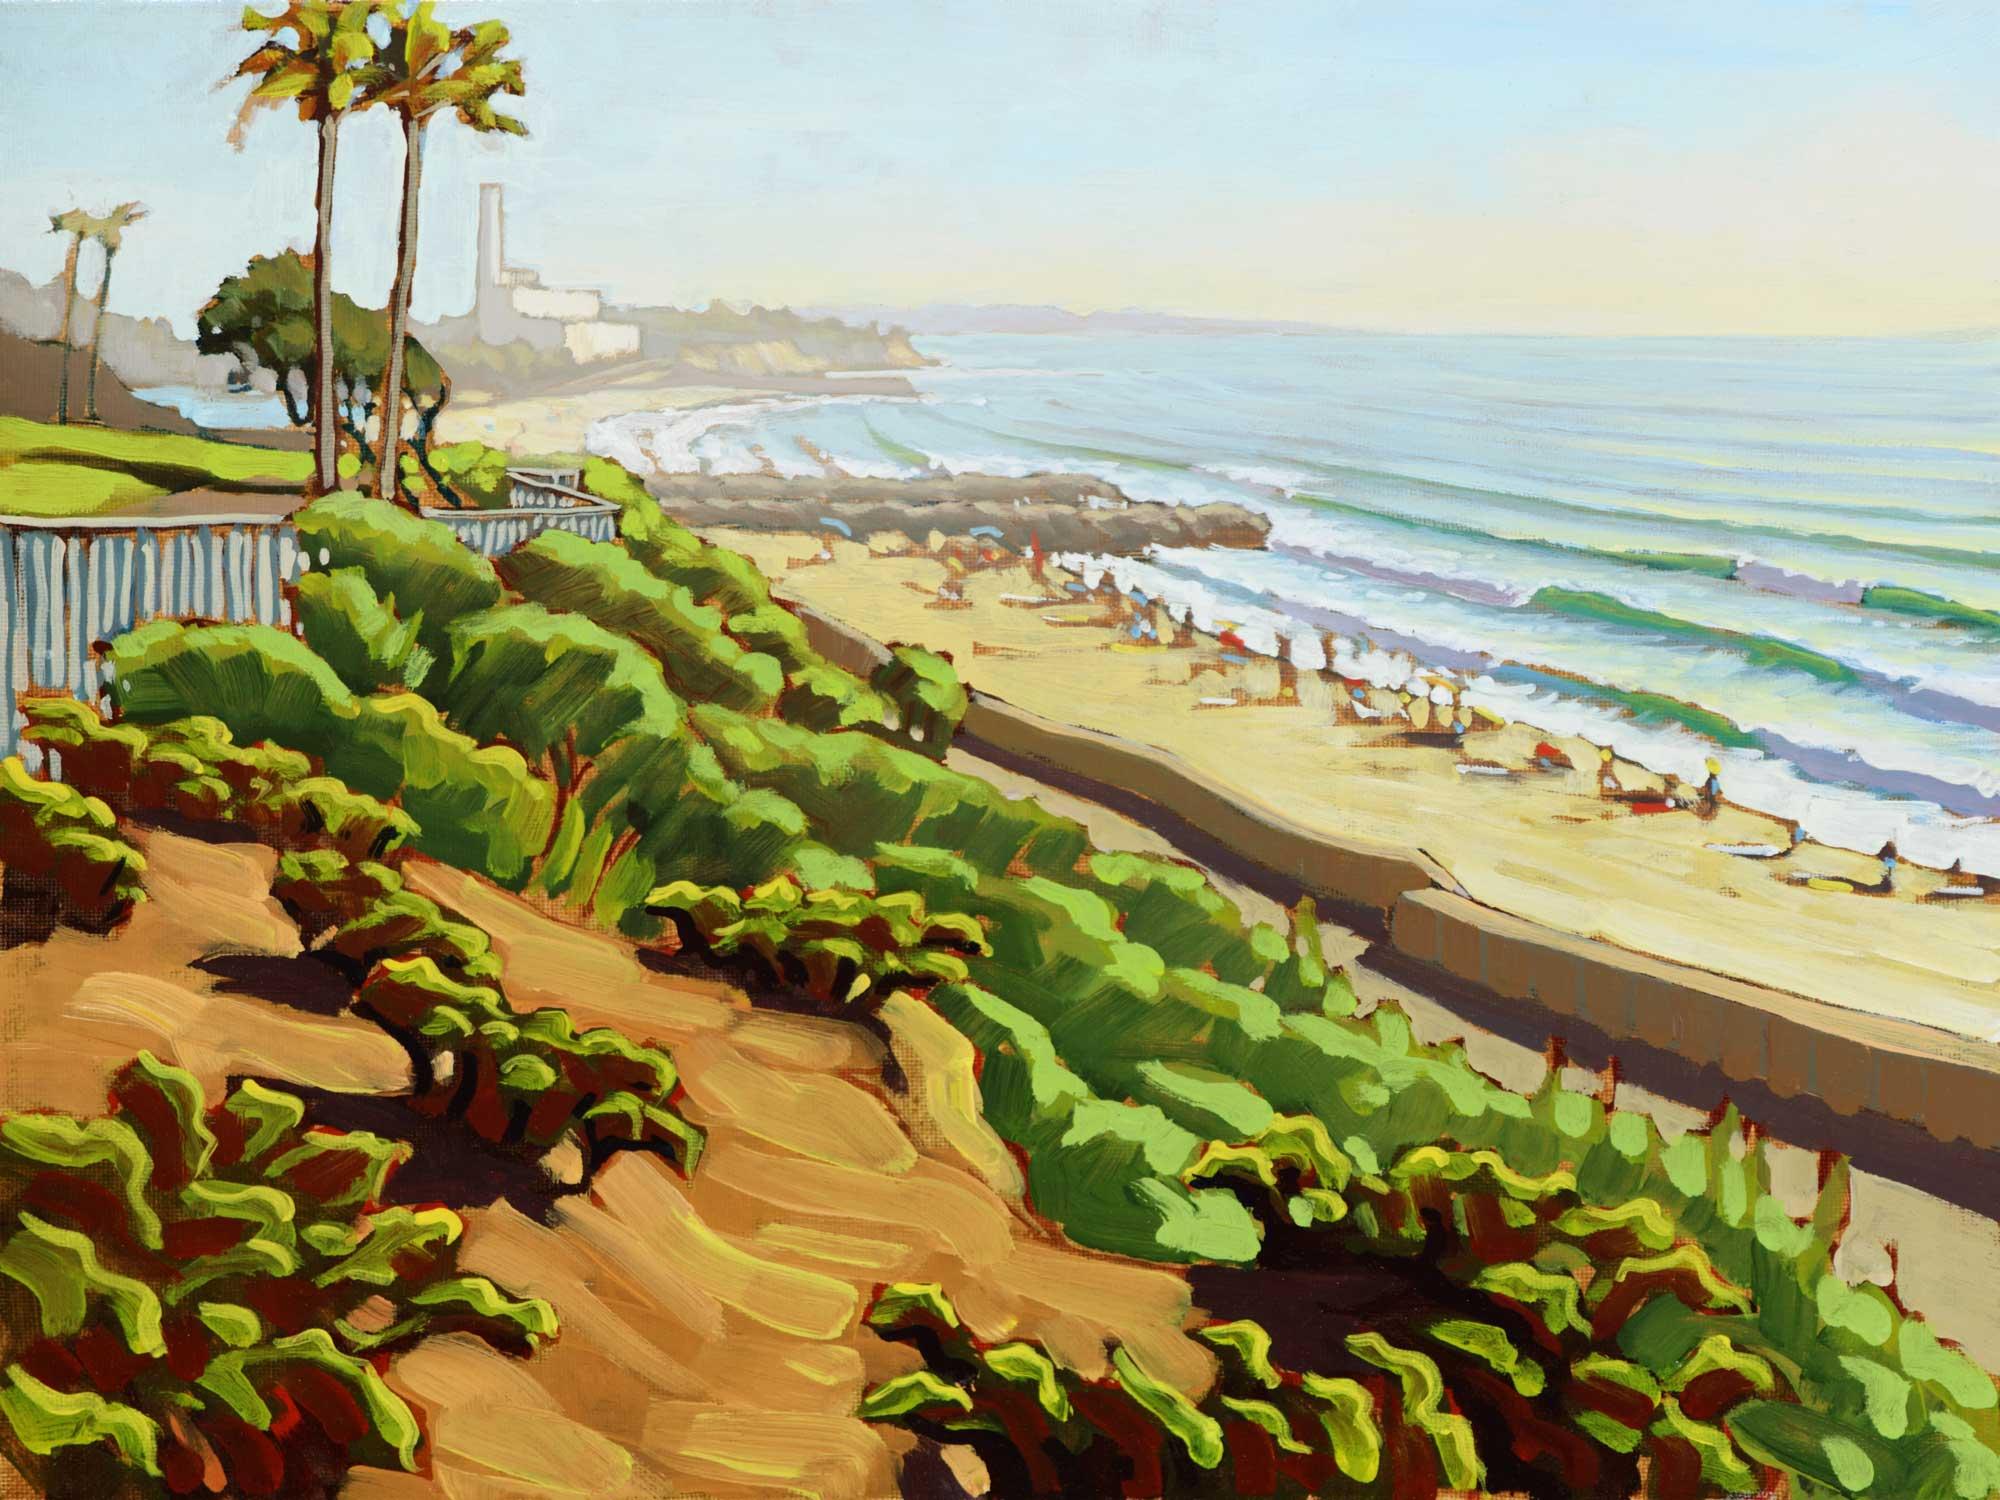 Plein air artwork from Tamarack near Calsbad on the San Diego coast of southern California